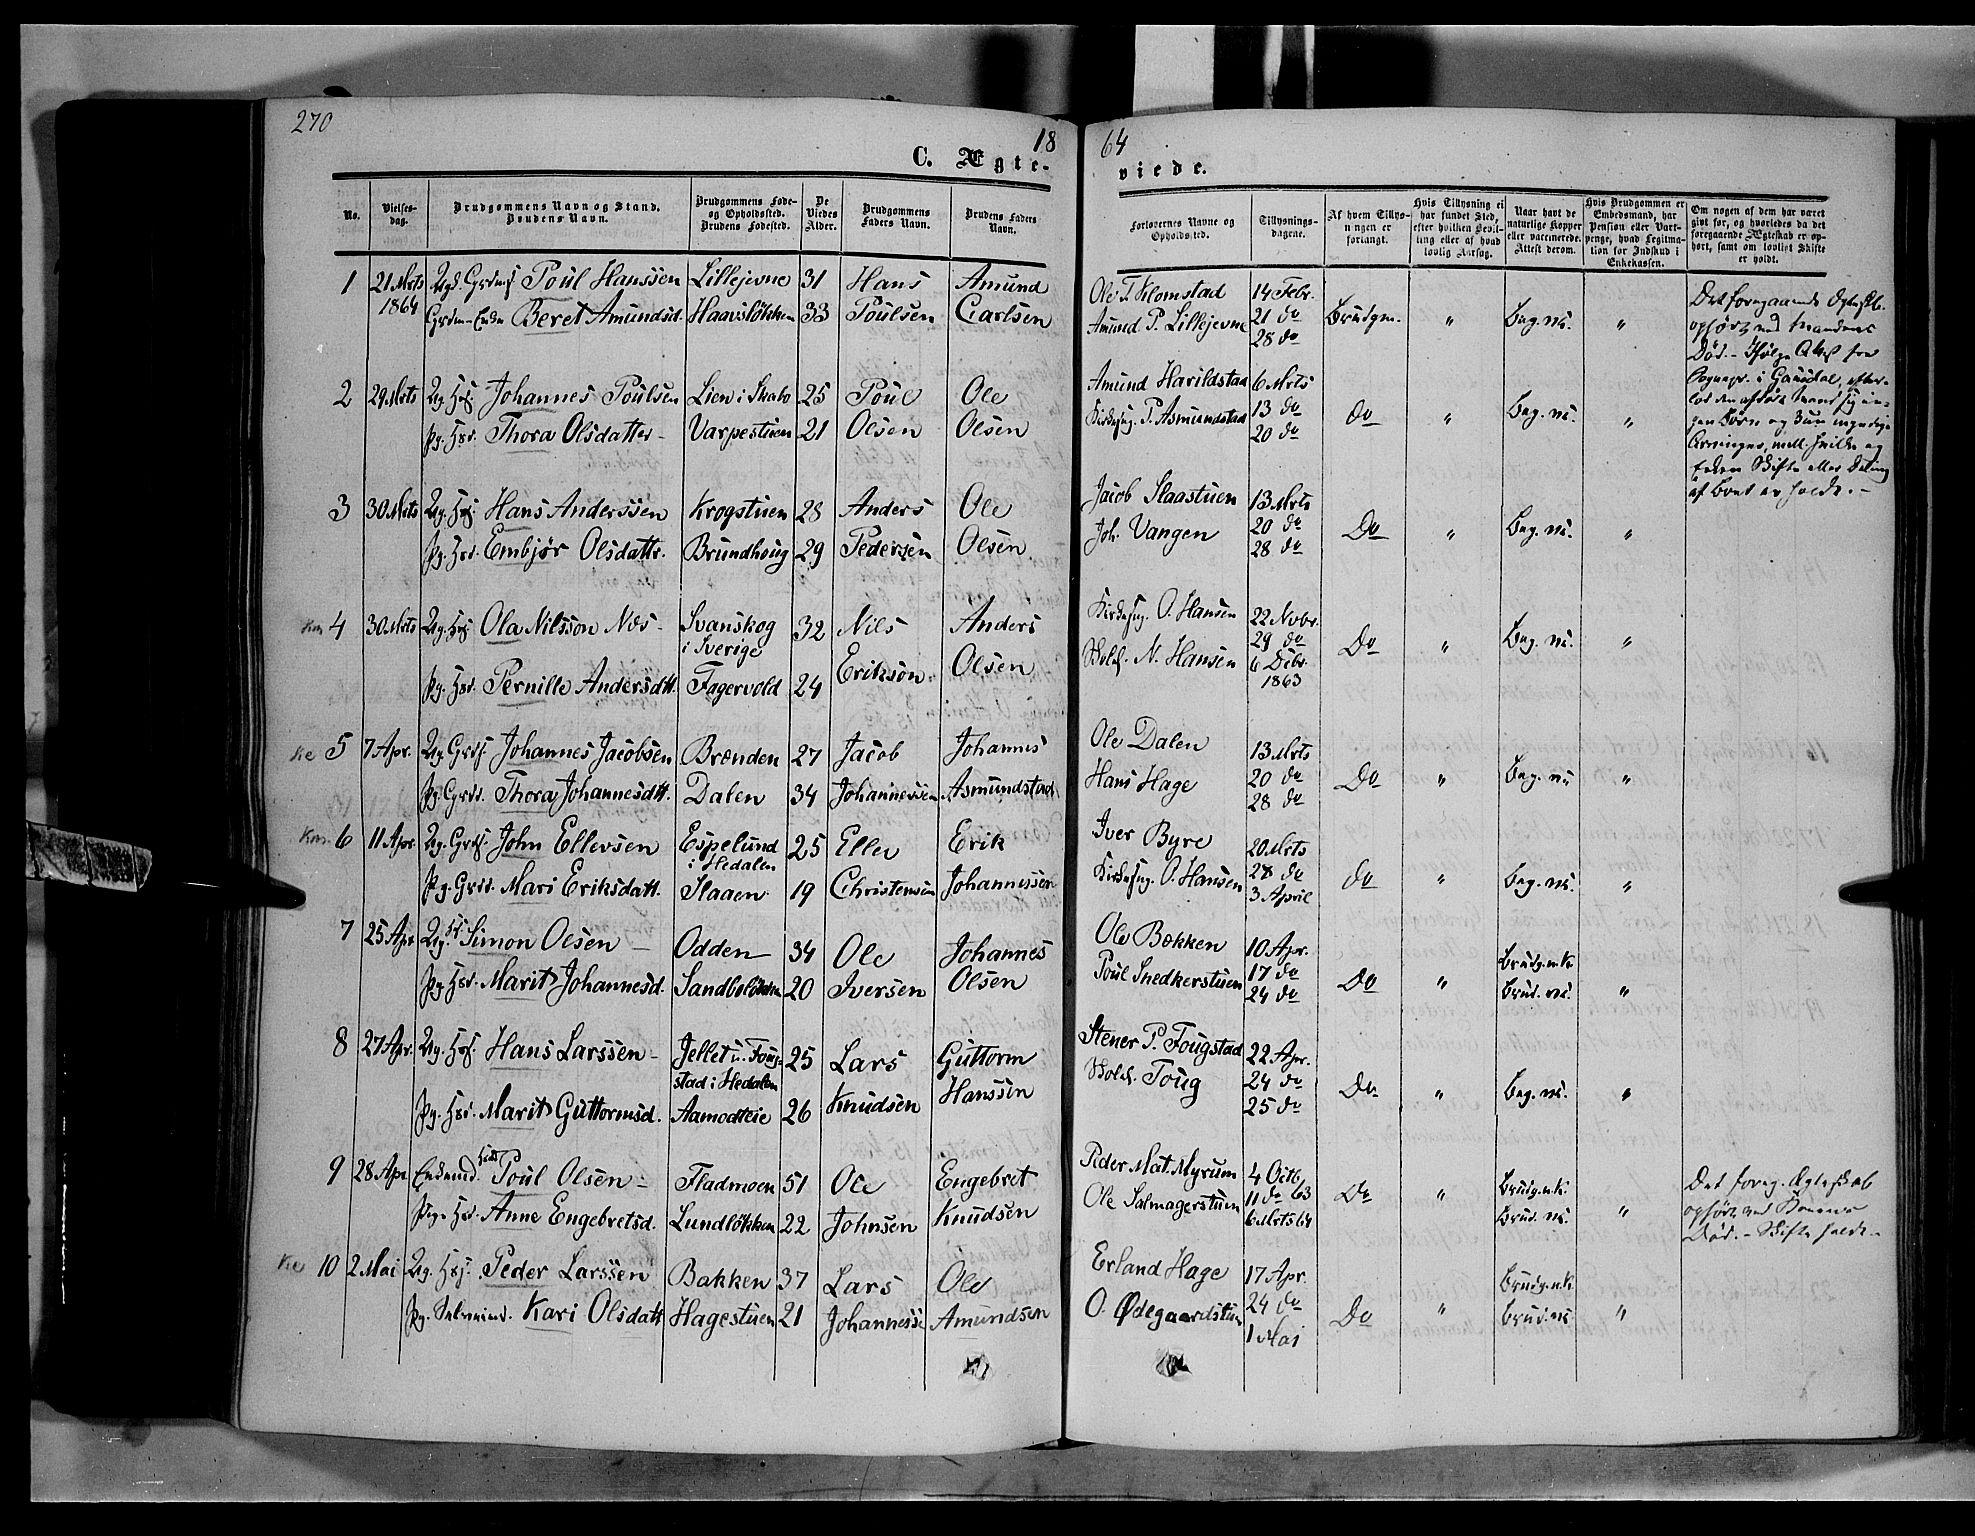 SAH, Nord-Fron prestekontor, Ministerialbok nr. 1, 1851-1864, s. 270